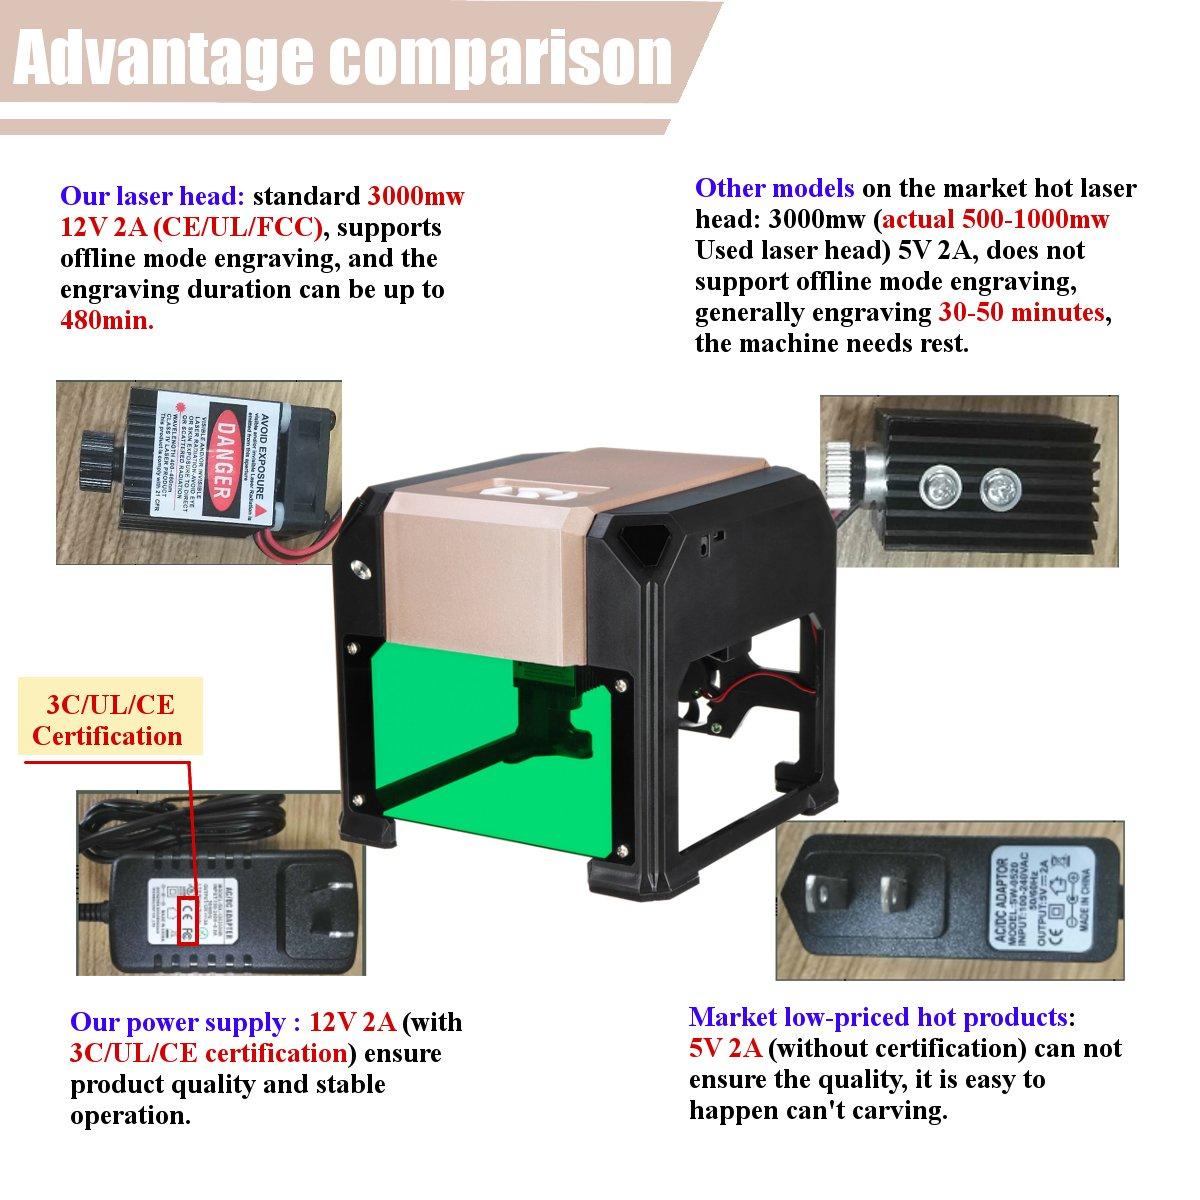 bluetooth Control 3000mW Professional DIY Desktop Mini CNC Laser Engraver Cutter Engraving Wood Cutting Machine Router 110 220V - 3